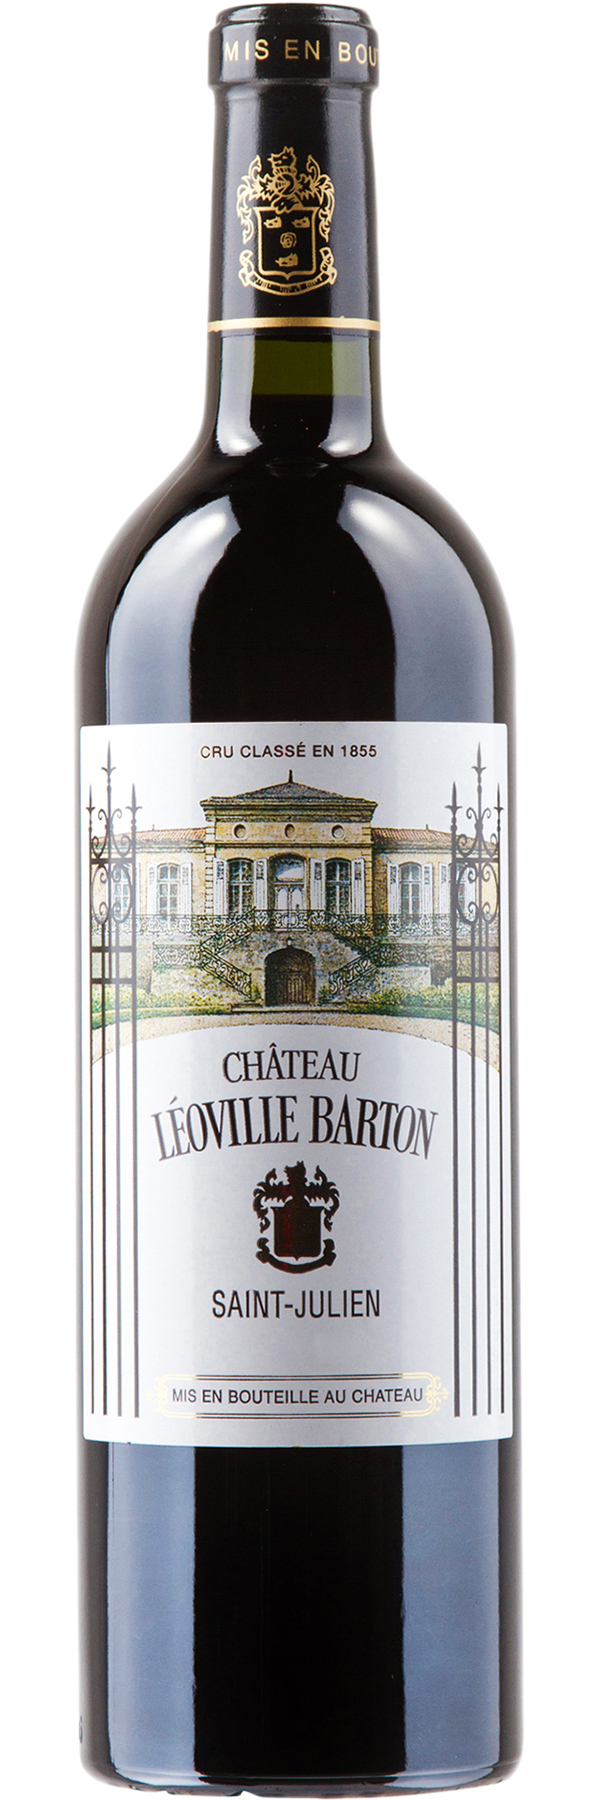 1999 Chateau Leoville Barton St.-Julien фото